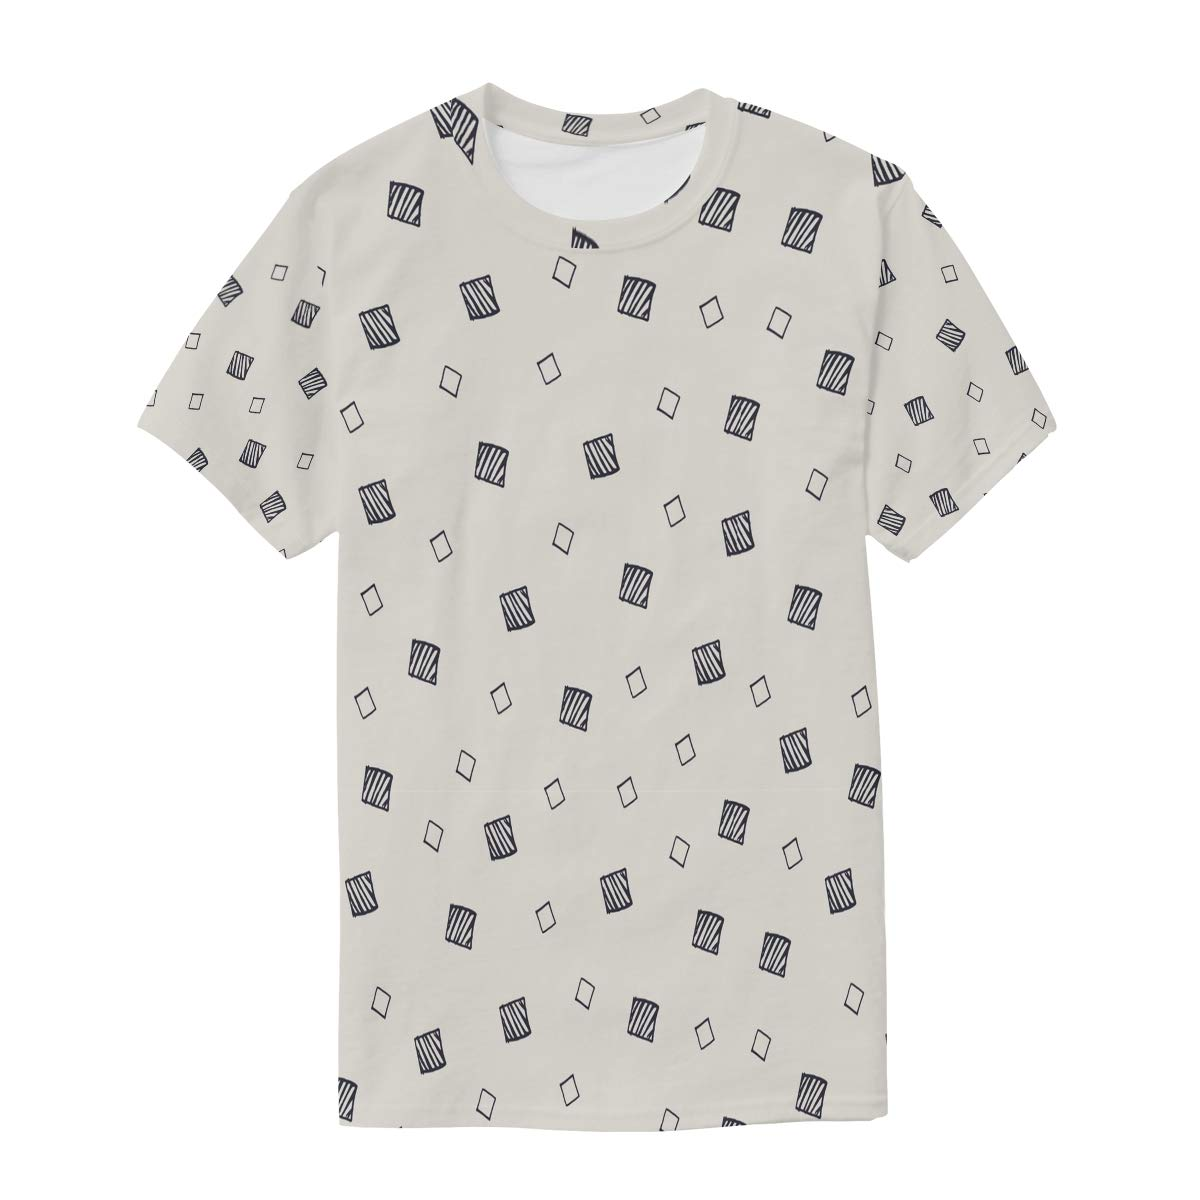 omniscient Mens Luxury Floral Dress Shirt Casual Printed Button Down Dress Shirt